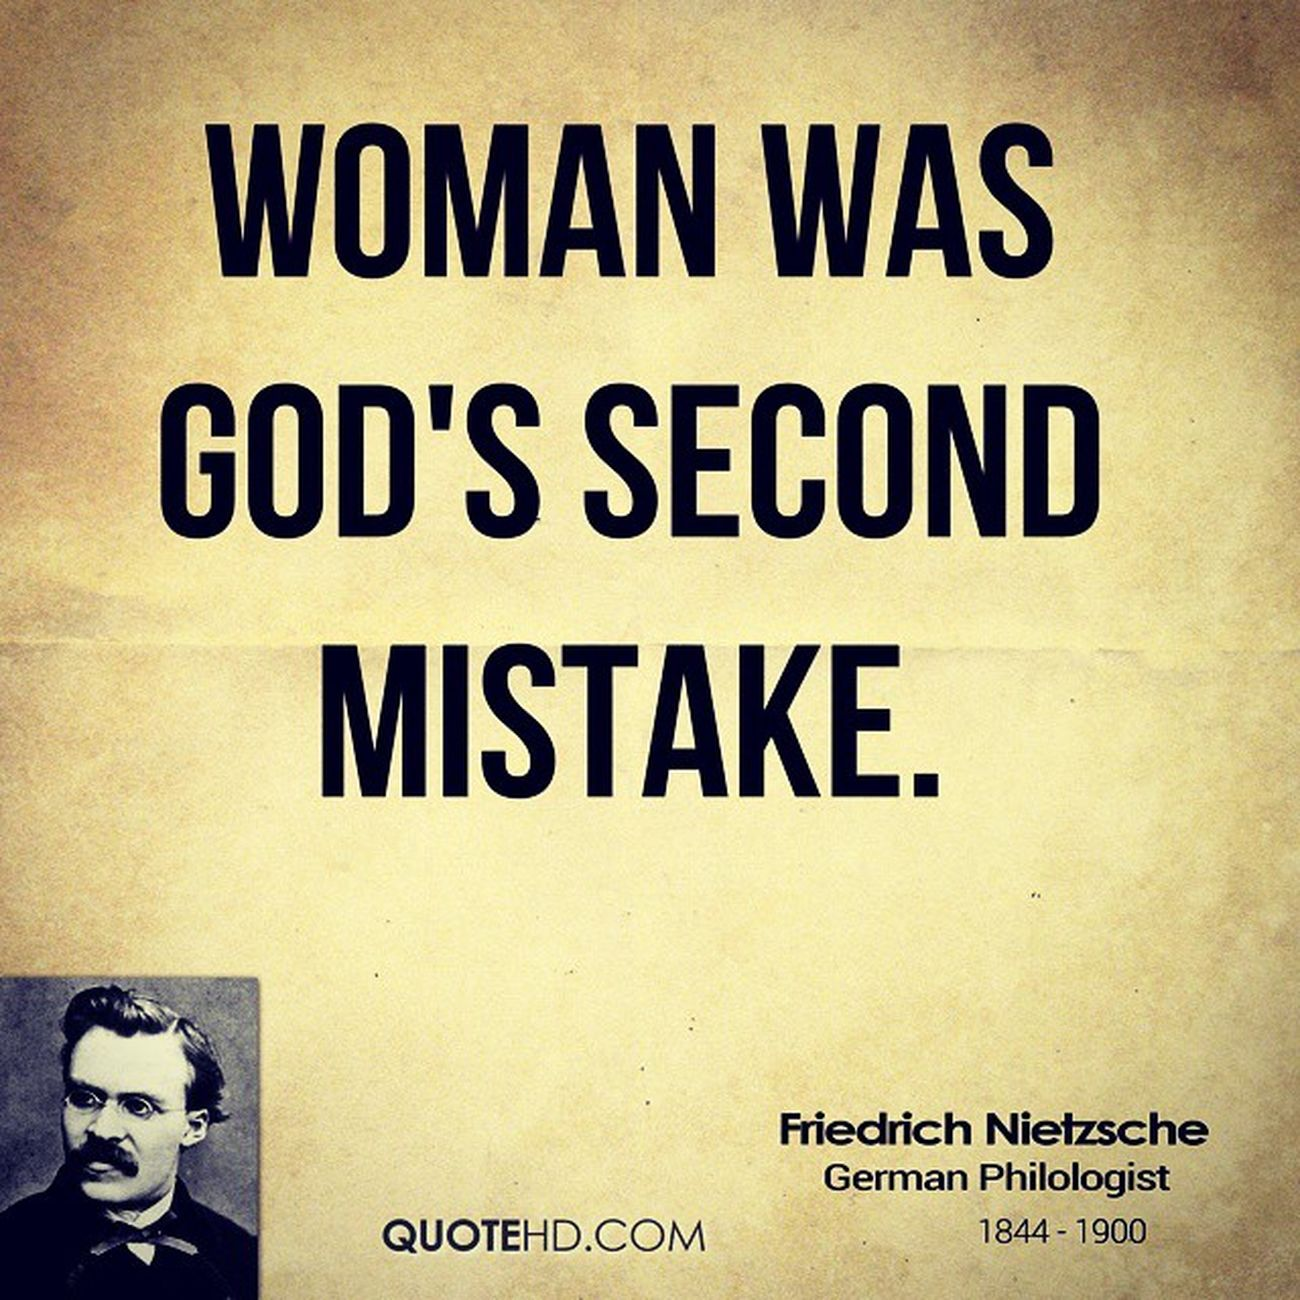 FriedrichNietzsche Nietzsche Womanquotes Psychology Philosophy